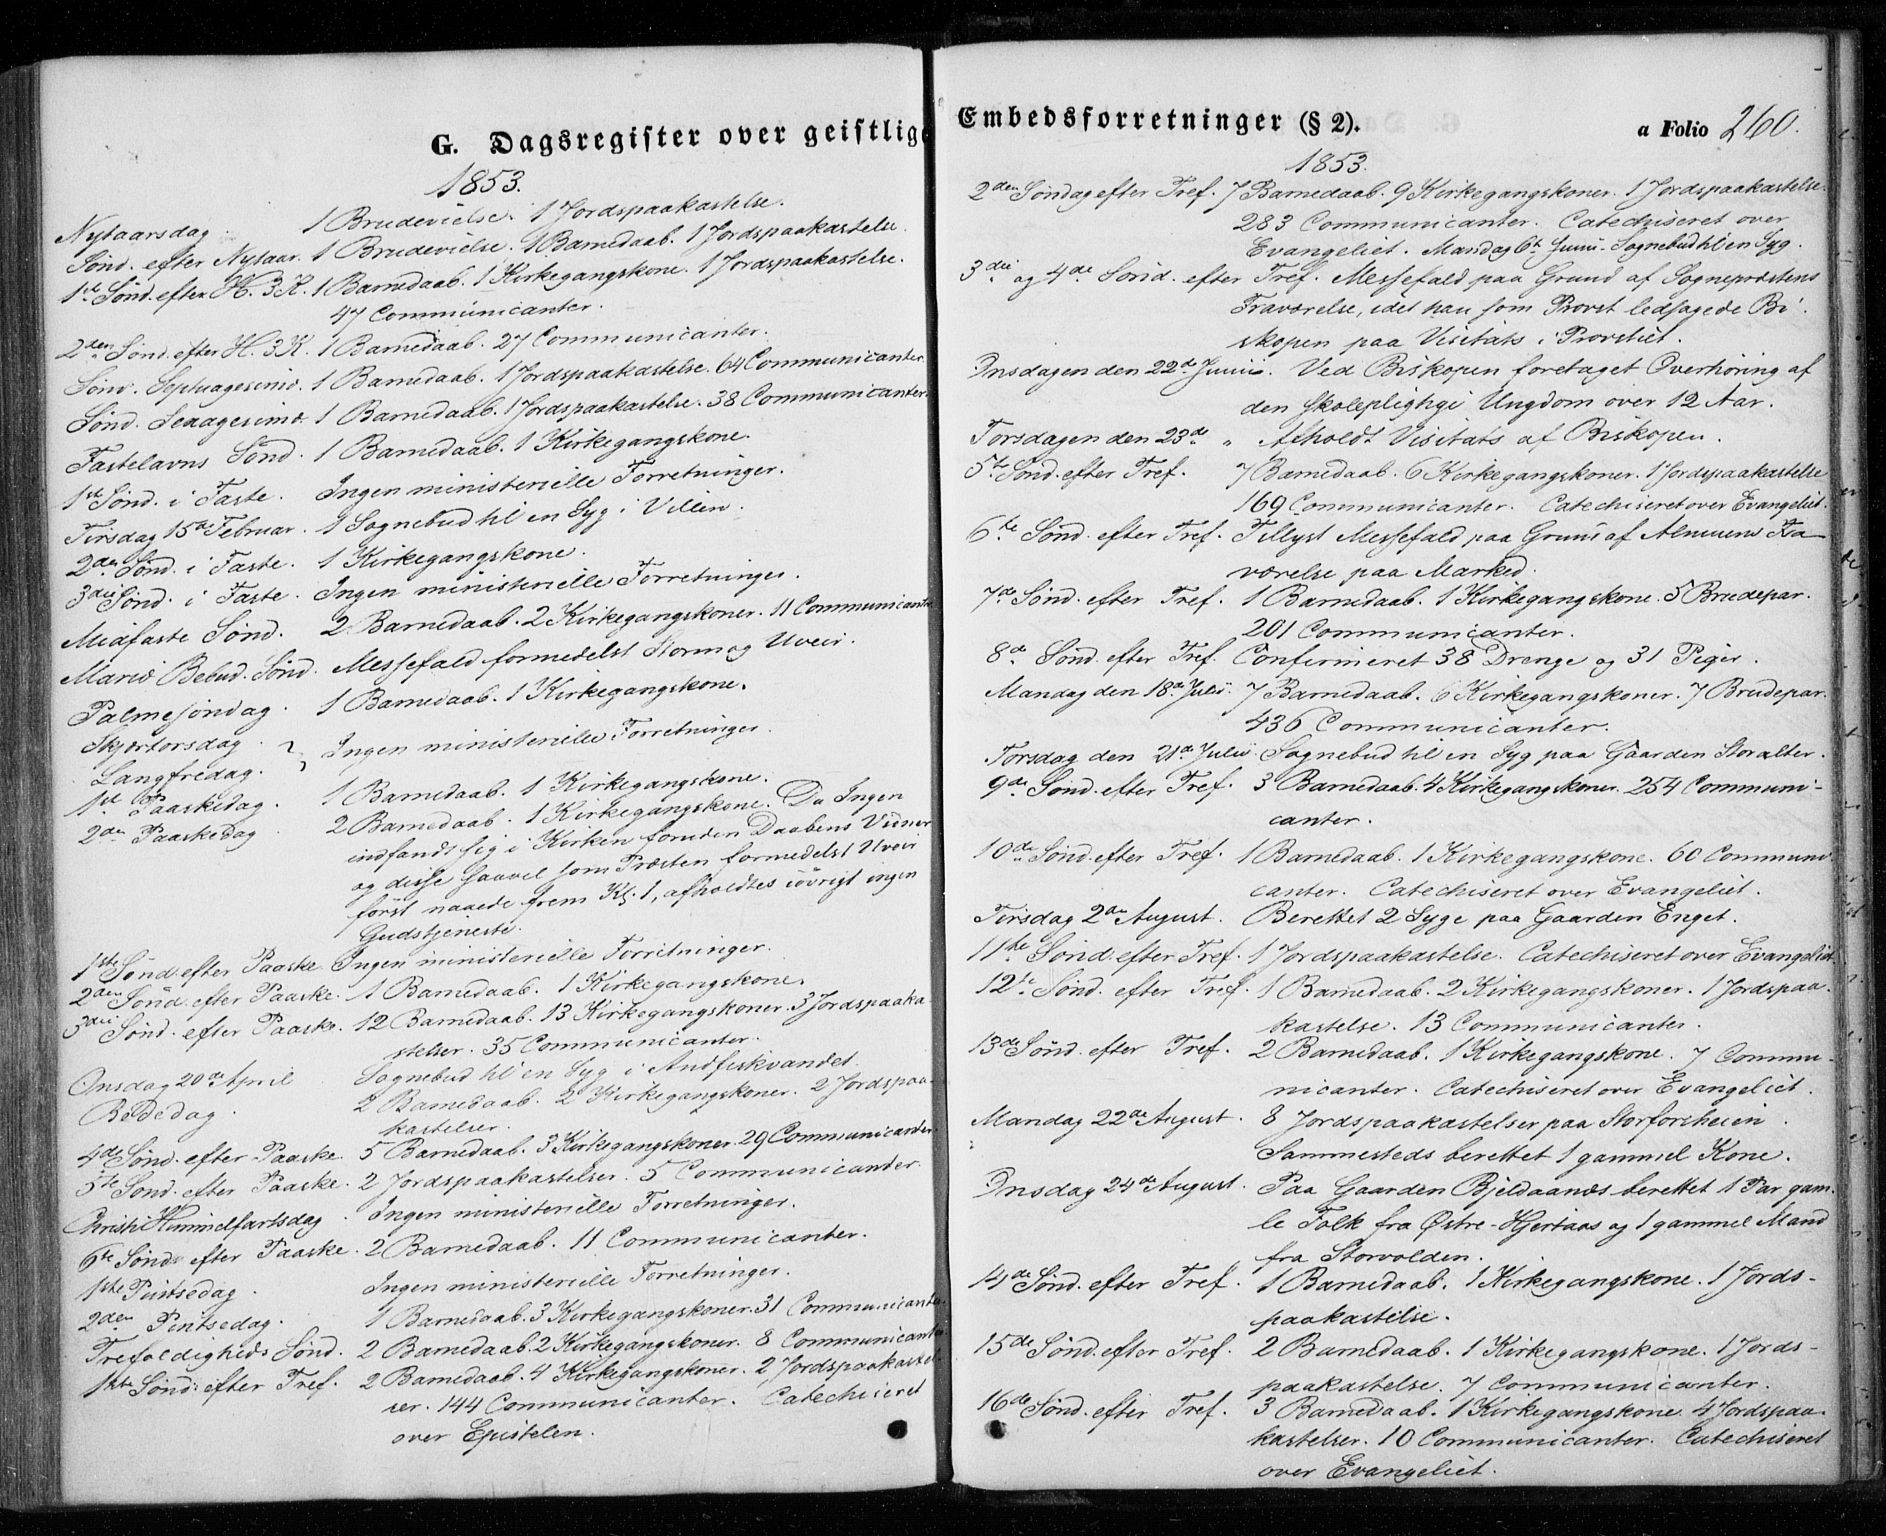 SAT, Ministerialprotokoller, klokkerbøker og fødselsregistre - Nordland, 827/L0392: Ministerialbok nr. 827A04, 1853-1866, s. 260